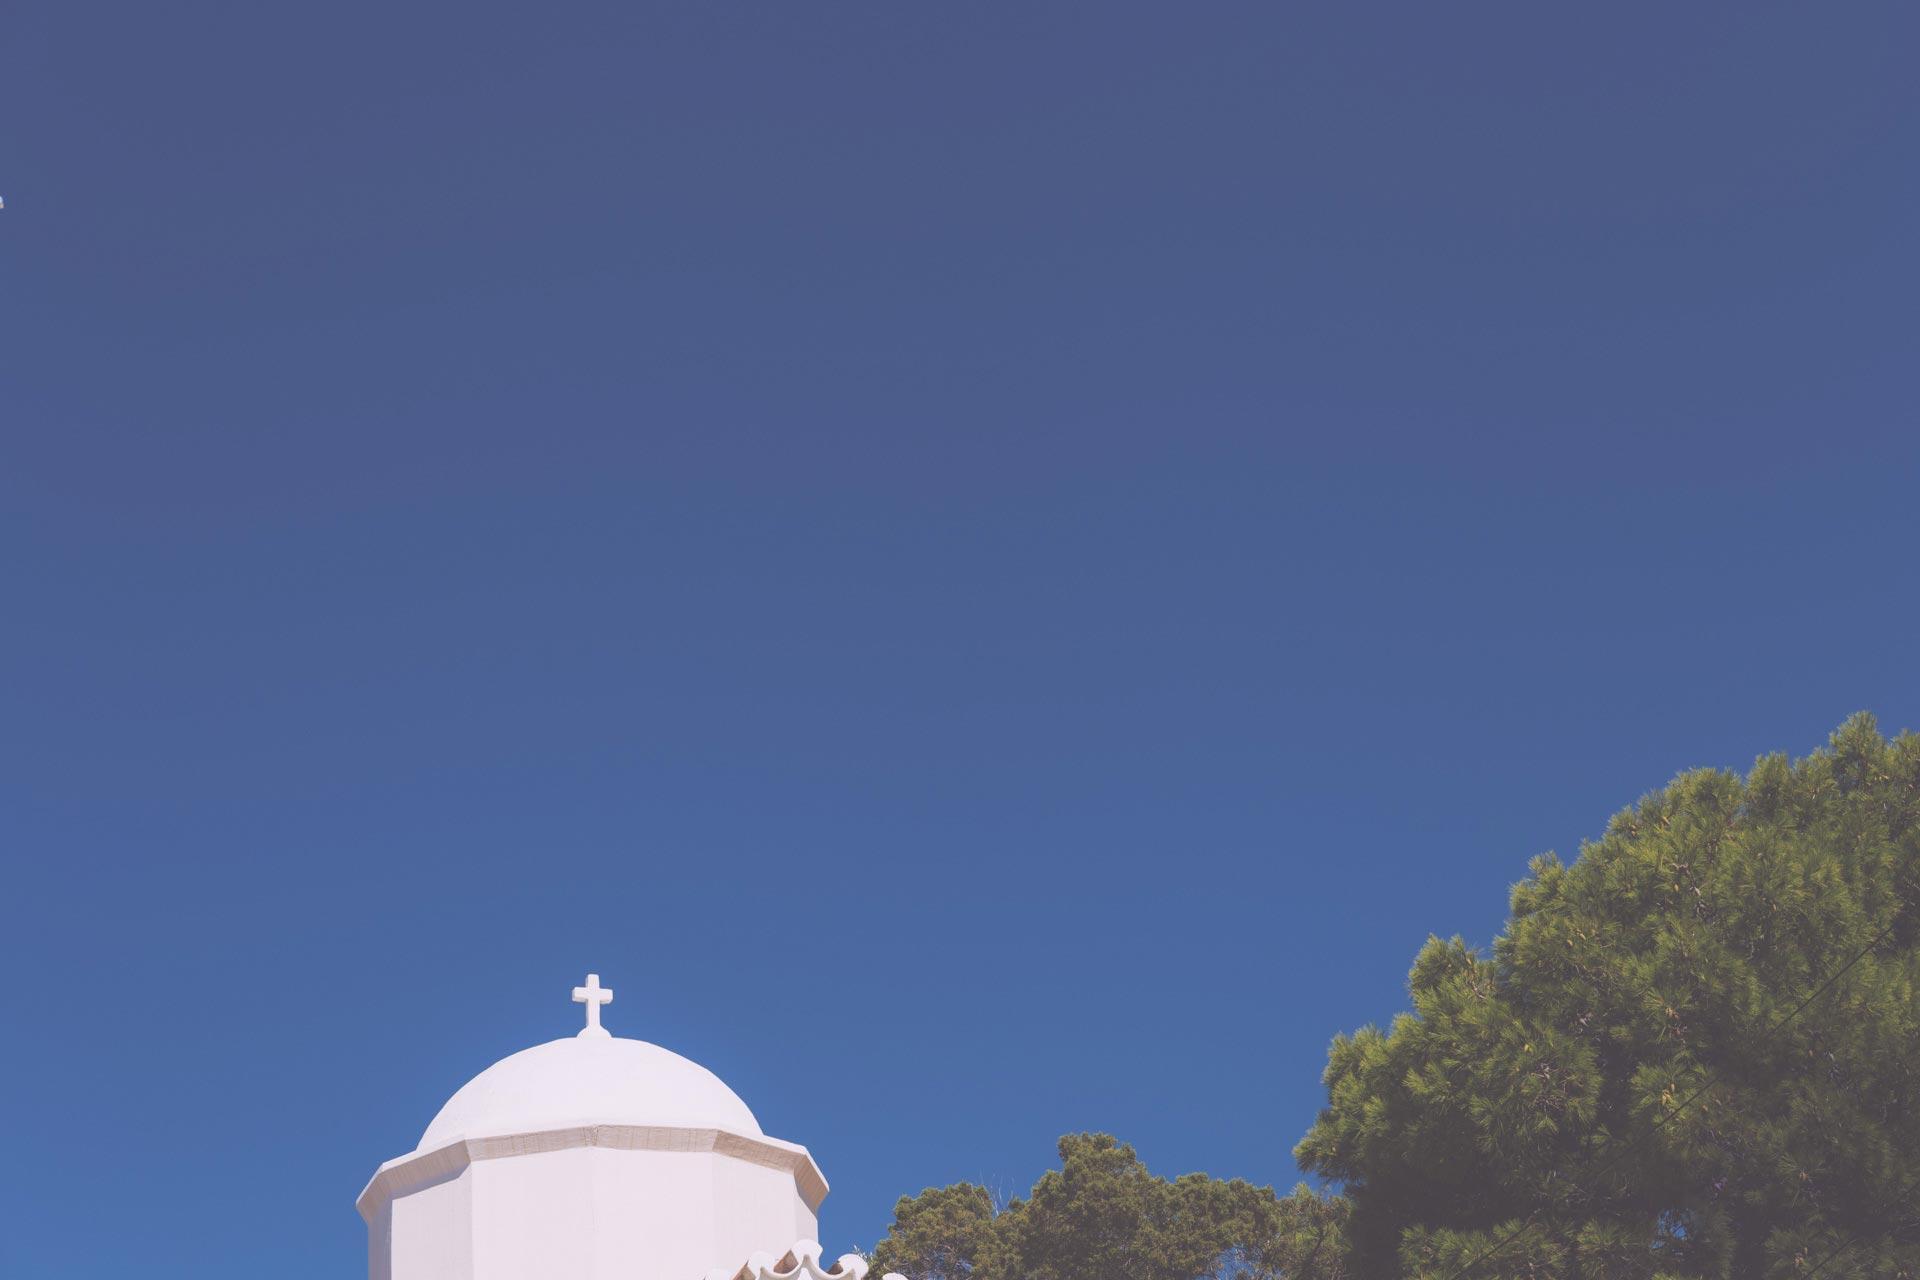 014 PhotoVaptisis Spetses vaptisi βαπτιση μωρο βαπτιστικά βαπριση σπετσες αγιος μαμας διακοσμηση βάπτισης γονείς νονά